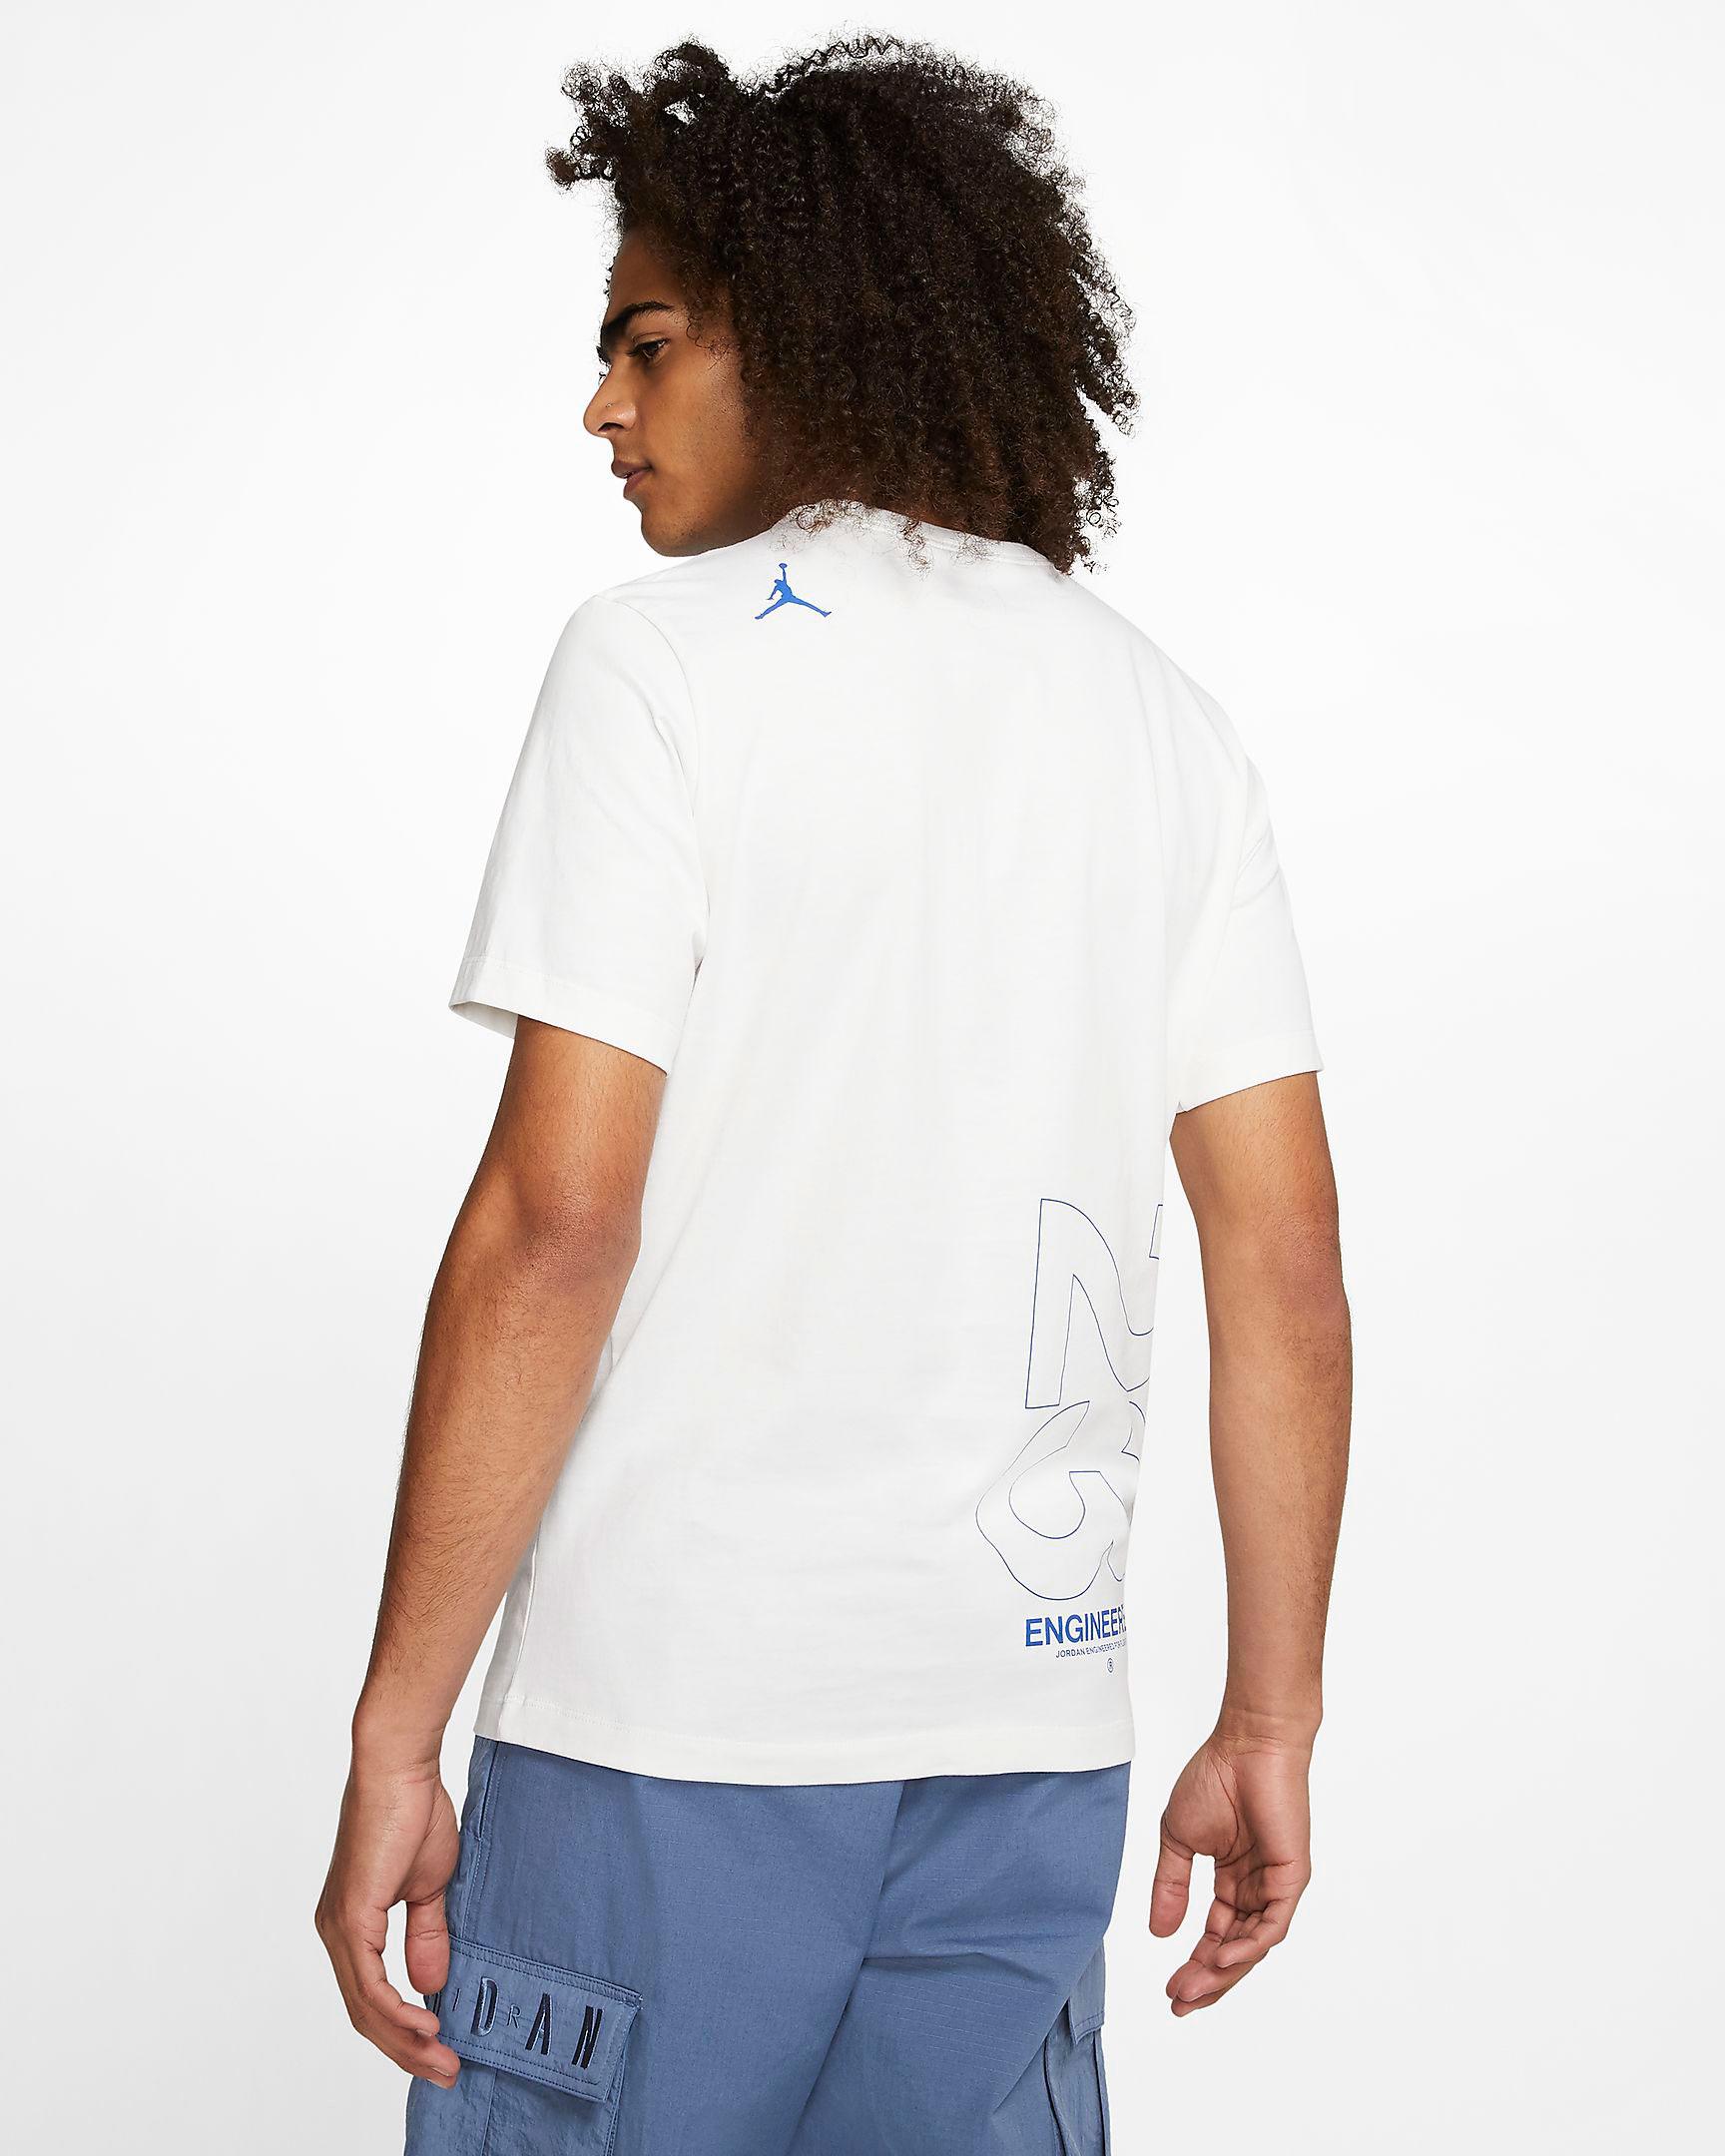 jordan-3-unc-matching-tee-shirt-2